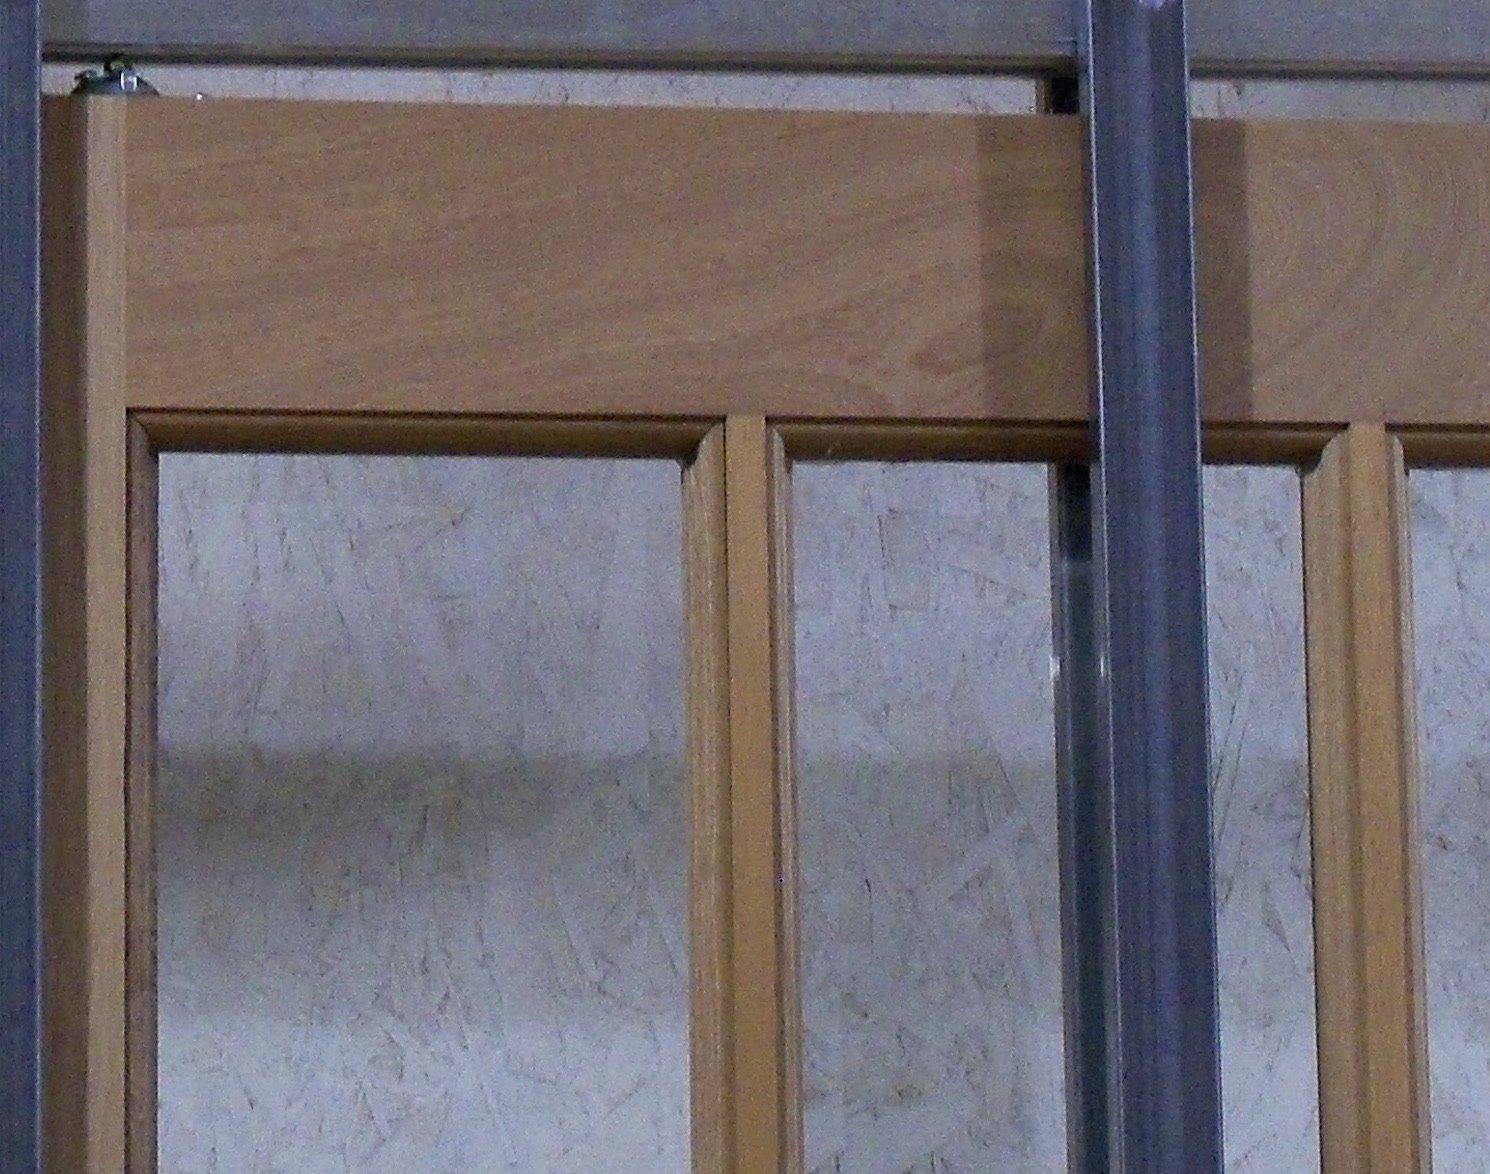 2450 Series- Heavy Duty Pocket Door Frame Kits- 2 x 4 -HBP (32'' x 80'')